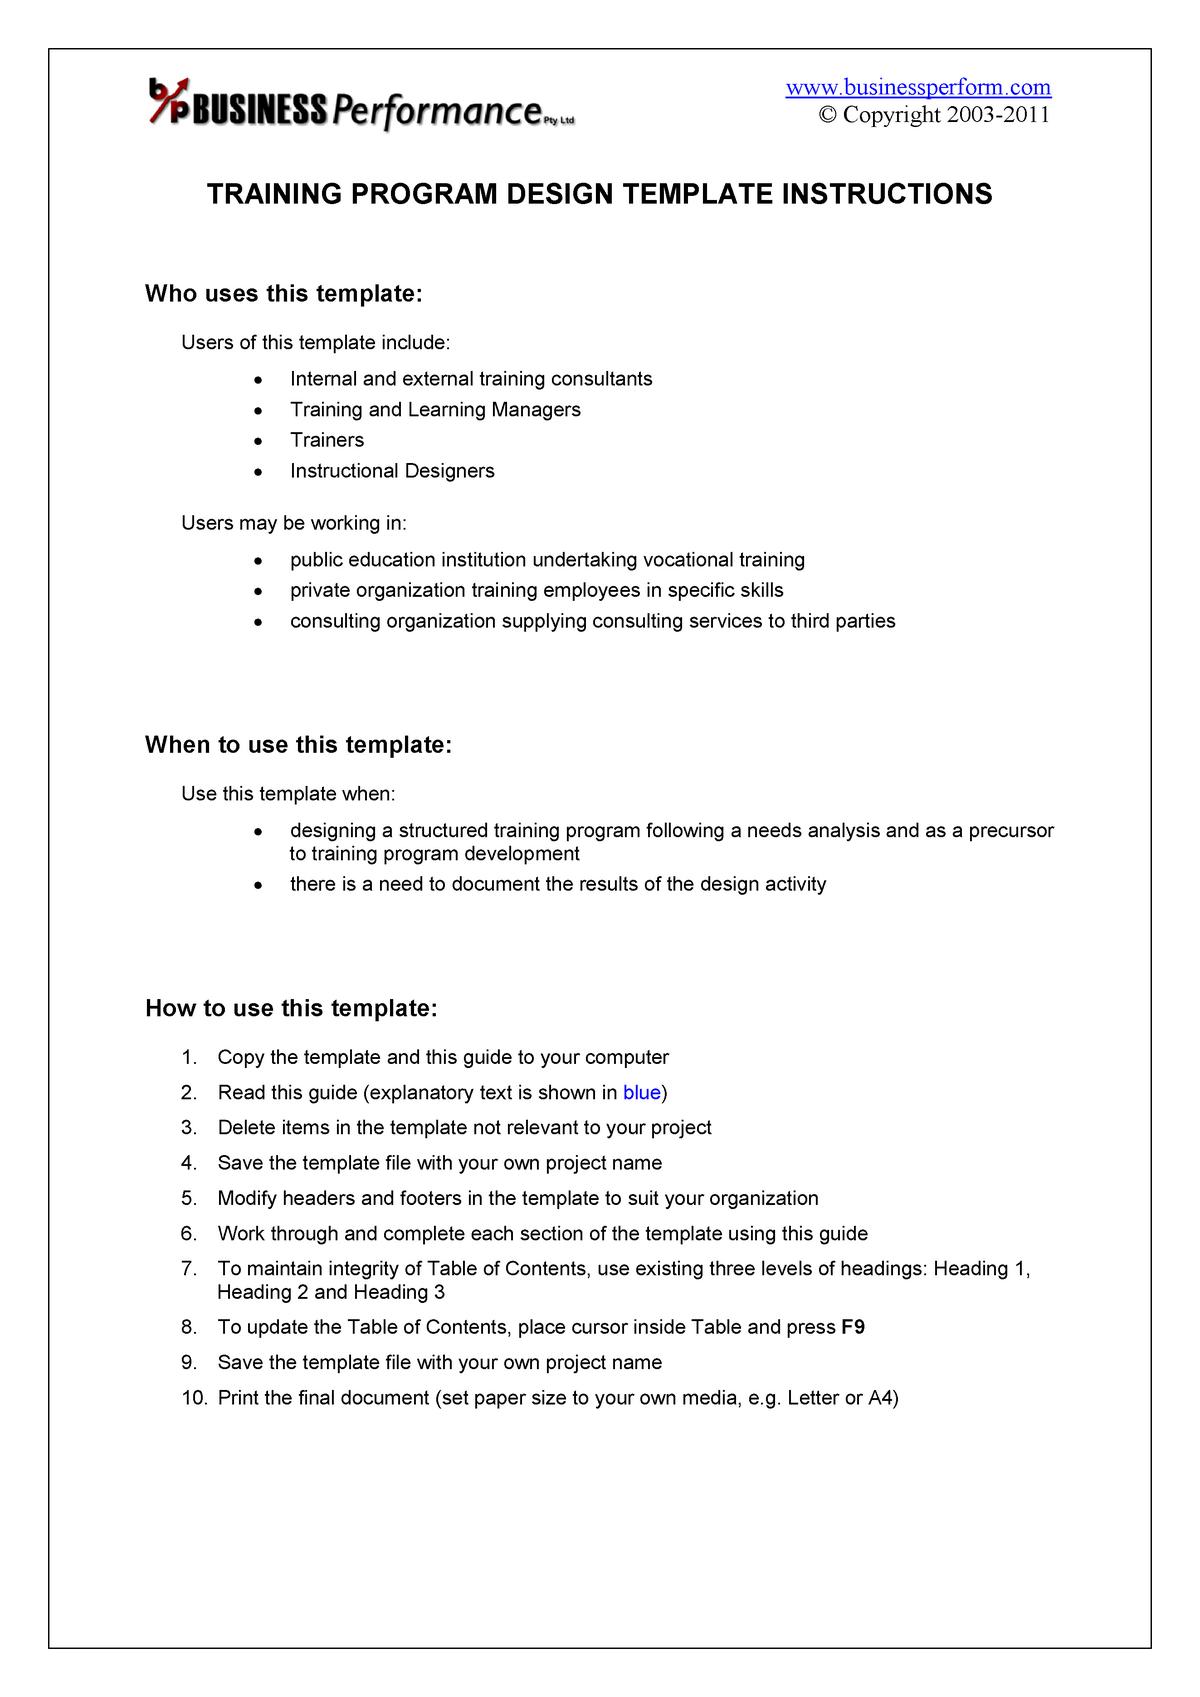 Training Program Design Guide Sample Bc 903 Studocu